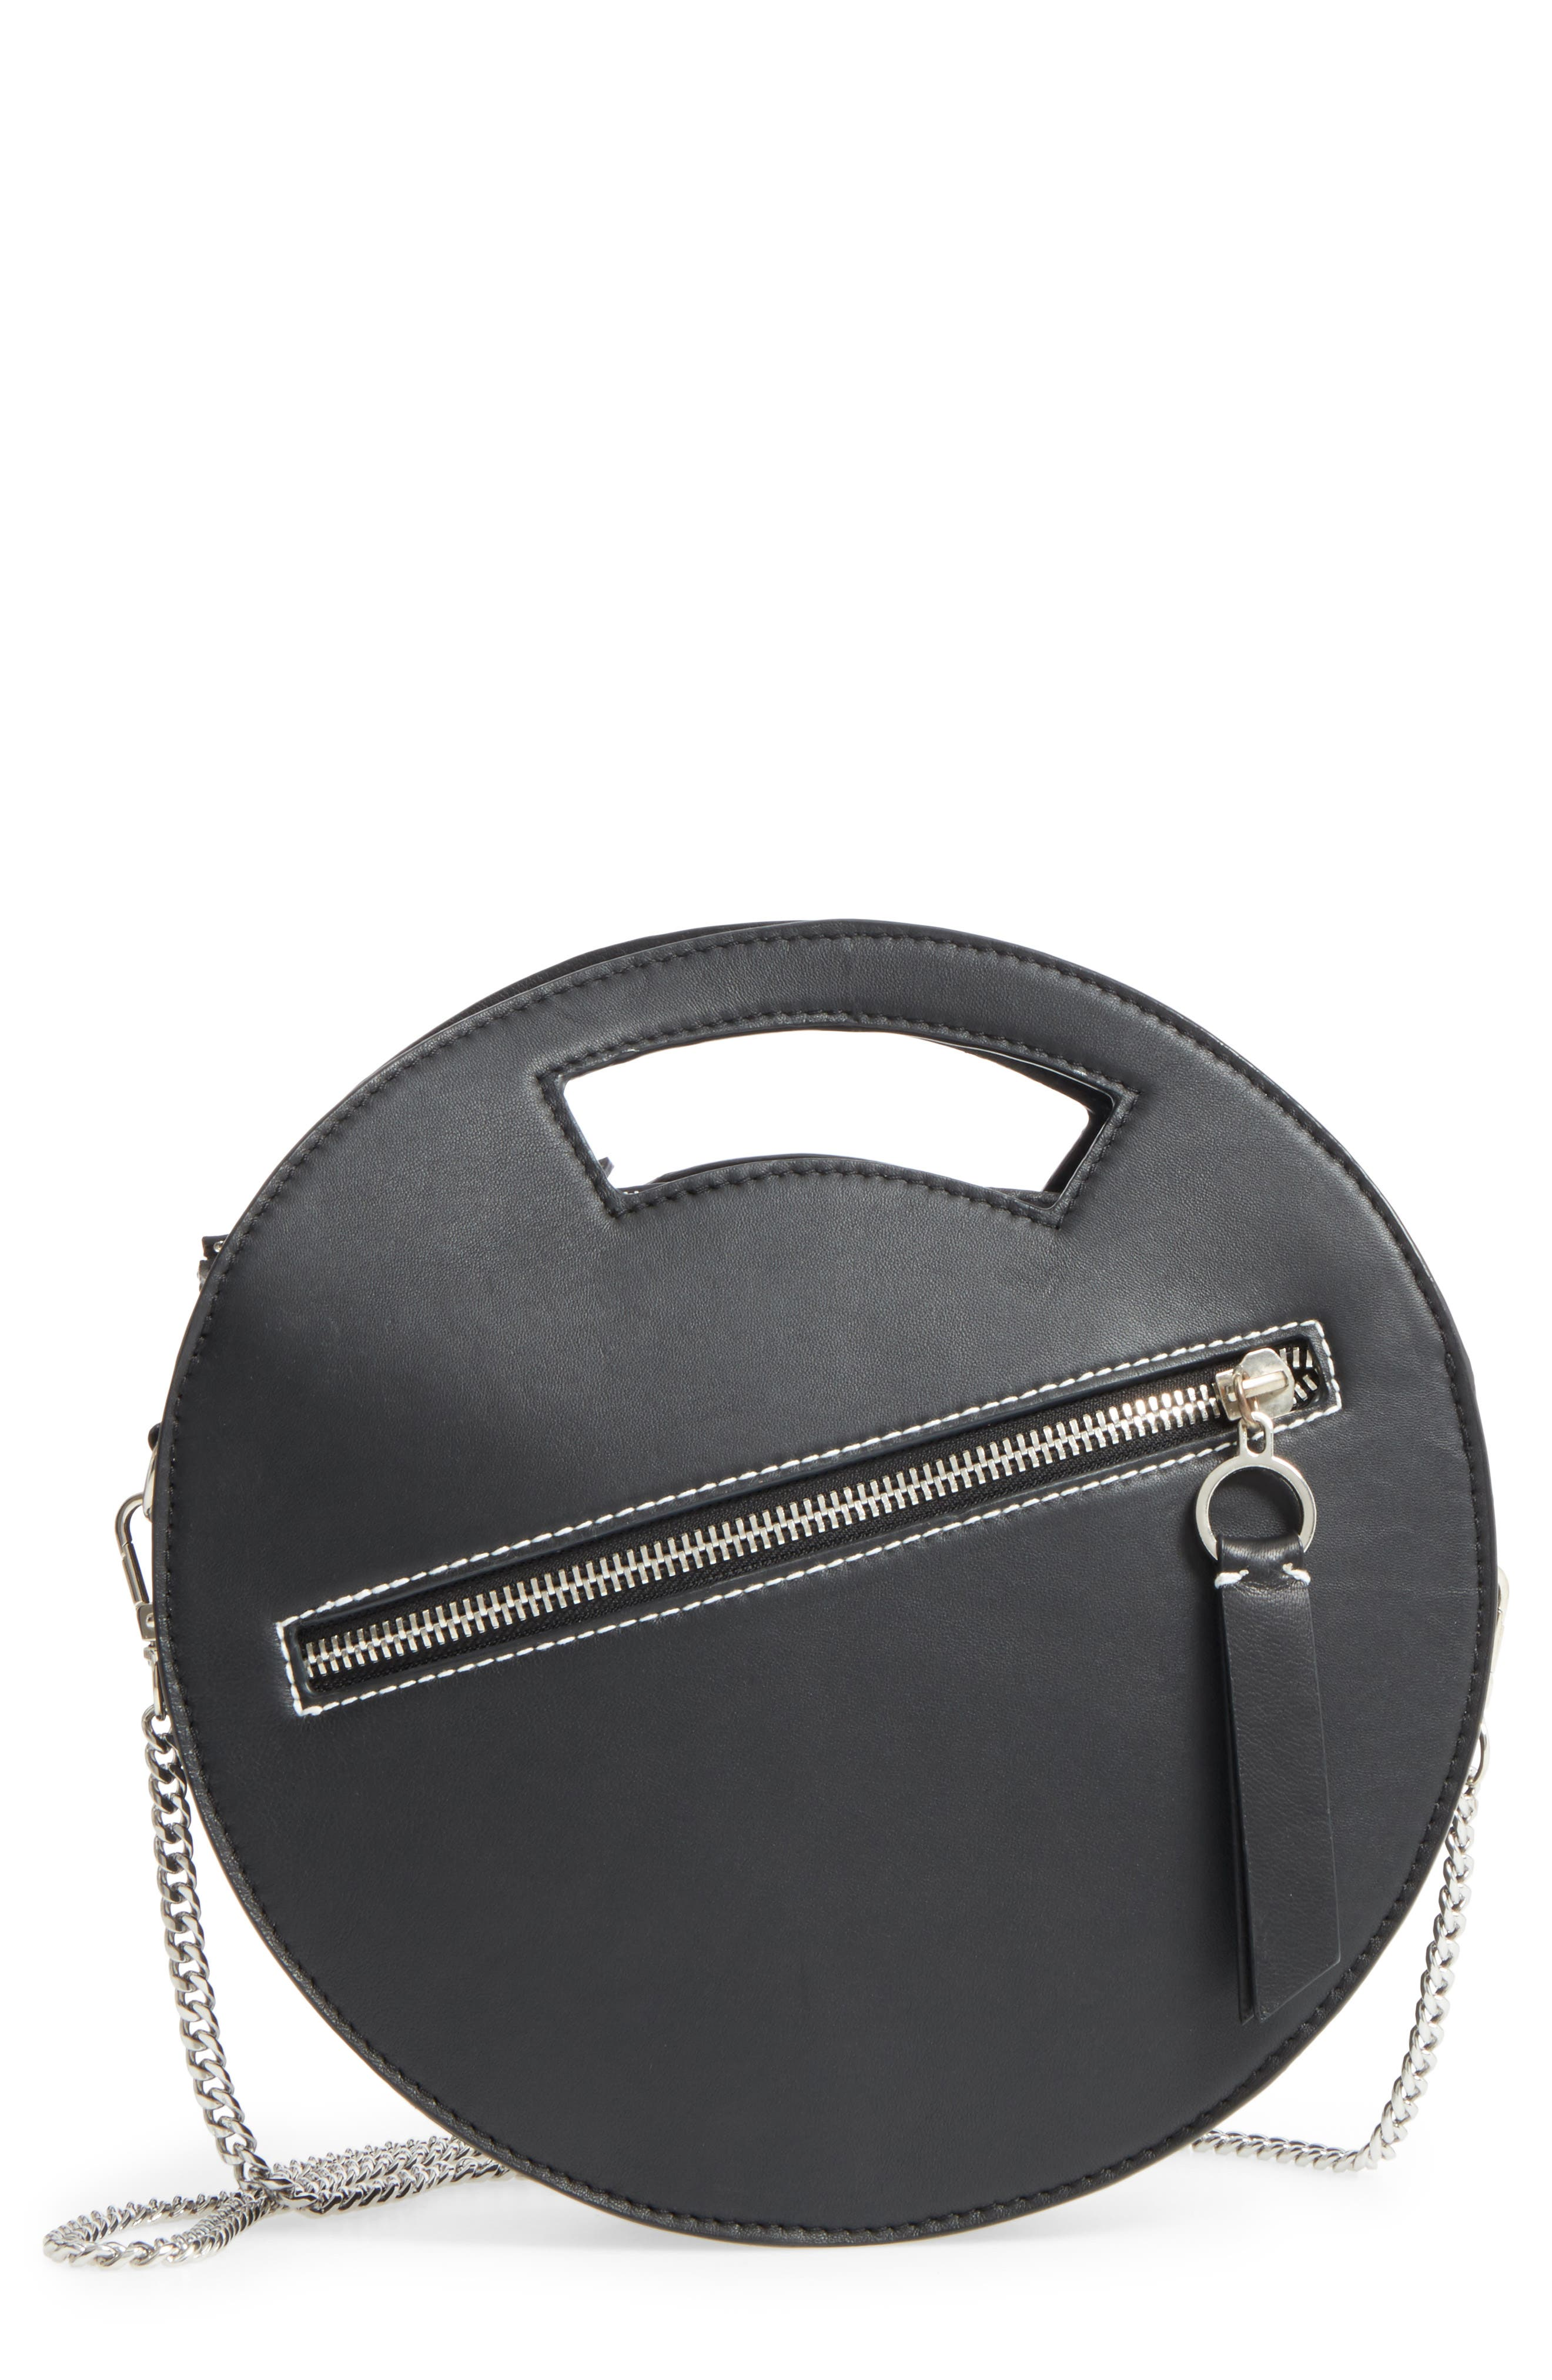 Premium Leather Circle Crossbody Bag,                             Main thumbnail 1, color,                             Black